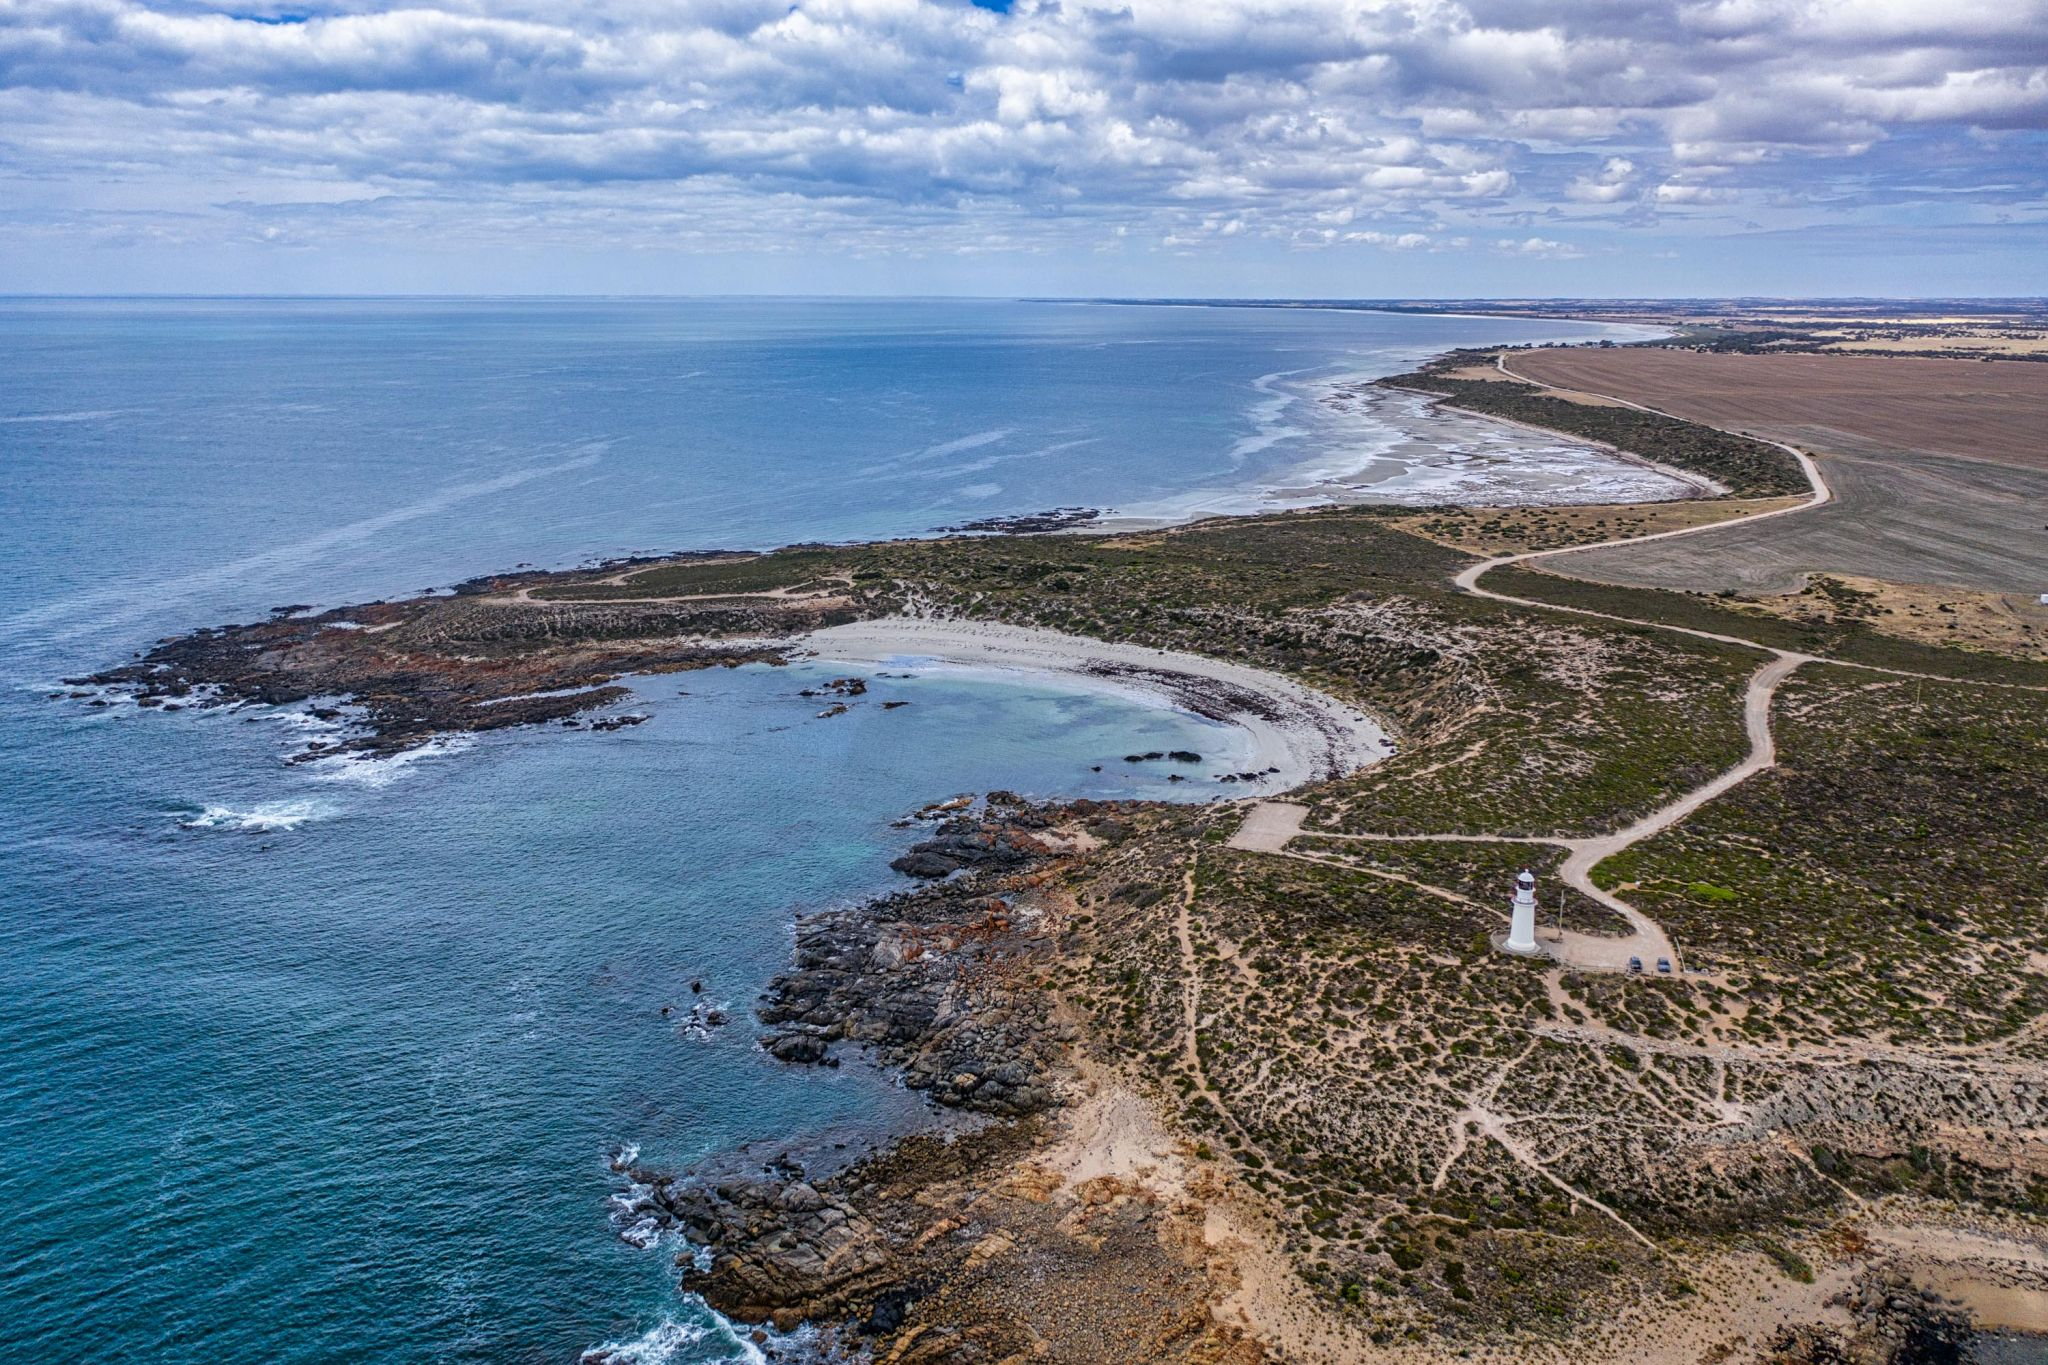 Corny Point Lighthouse drone, Yorke Peninsula SA, Australia